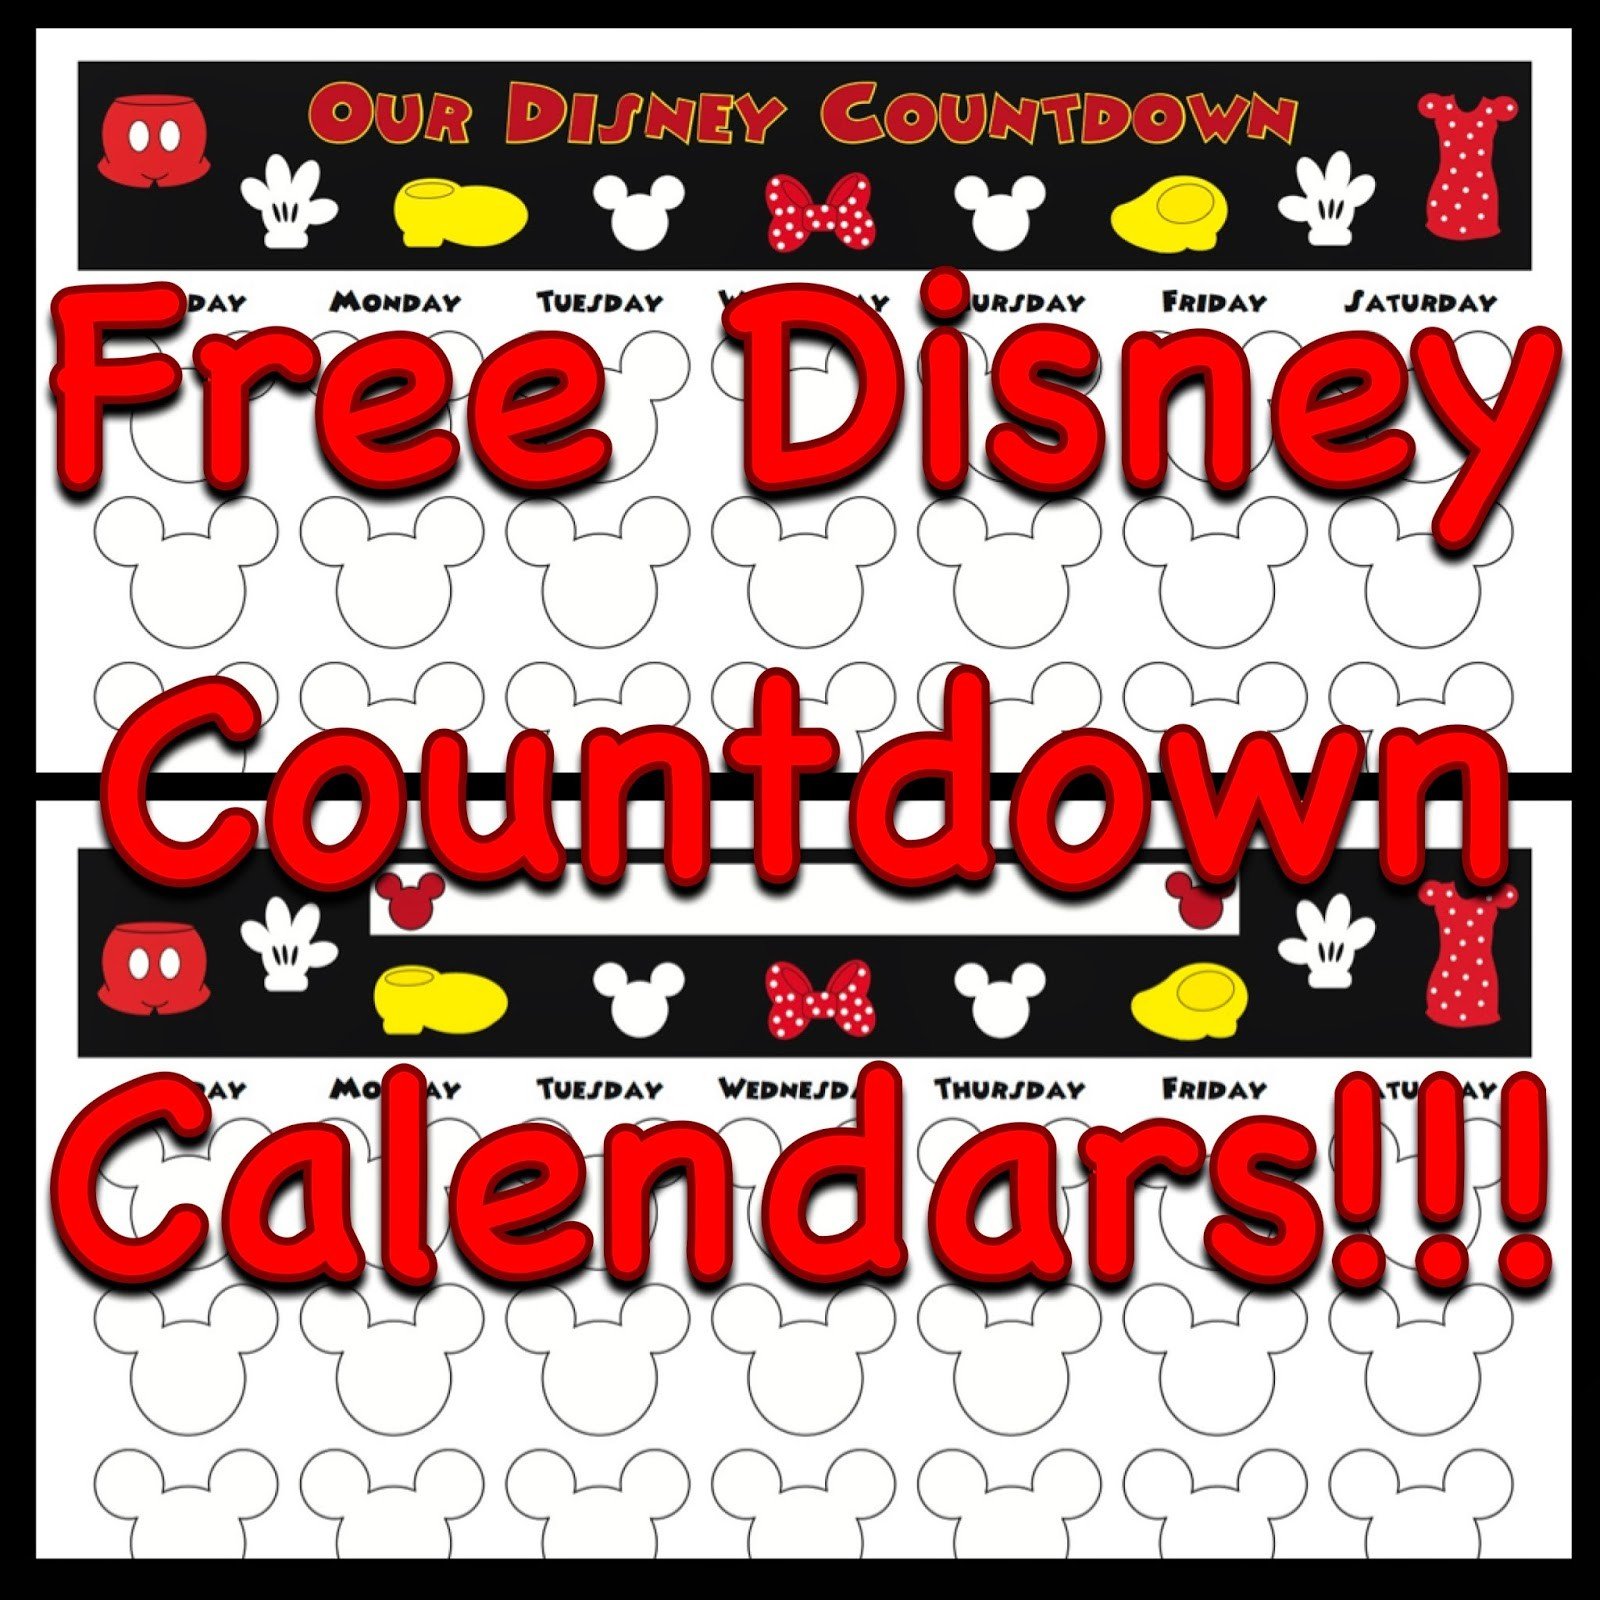 Countdown Calendar Printable My Disney Life Countdown Calendars